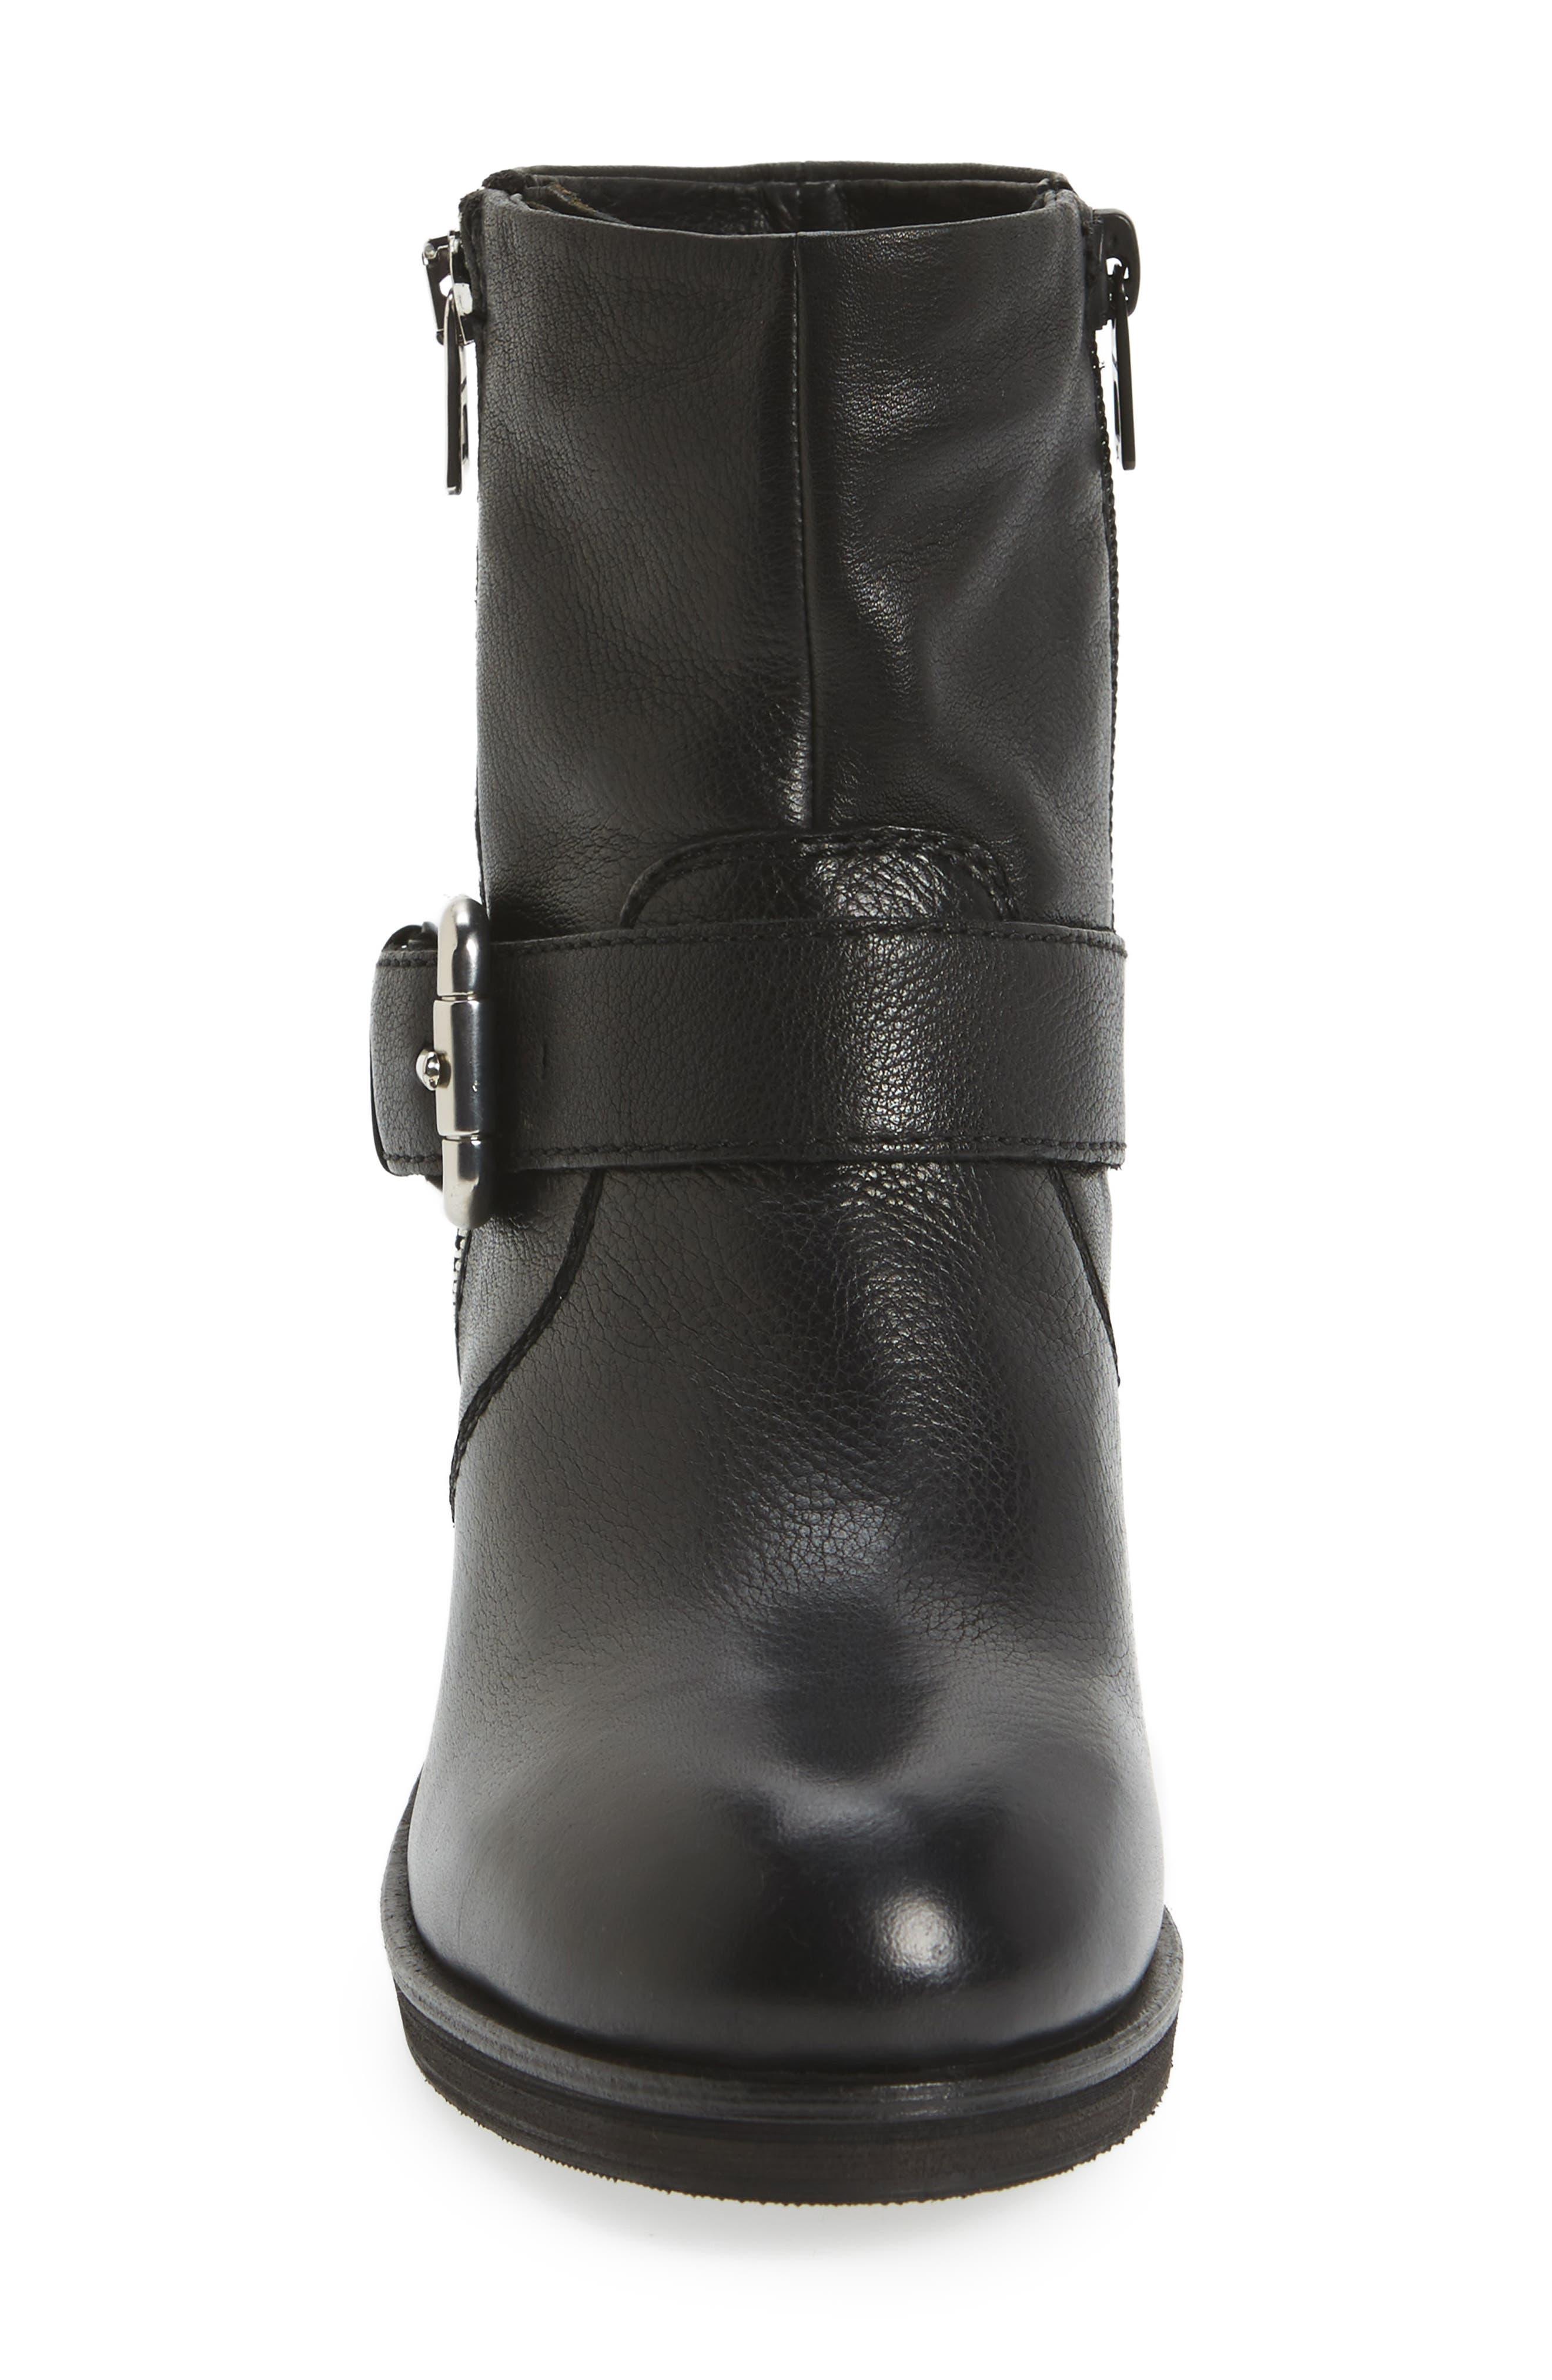 Balady Boot,                             Alternate thumbnail 5, color,                             Black/ Black Leather